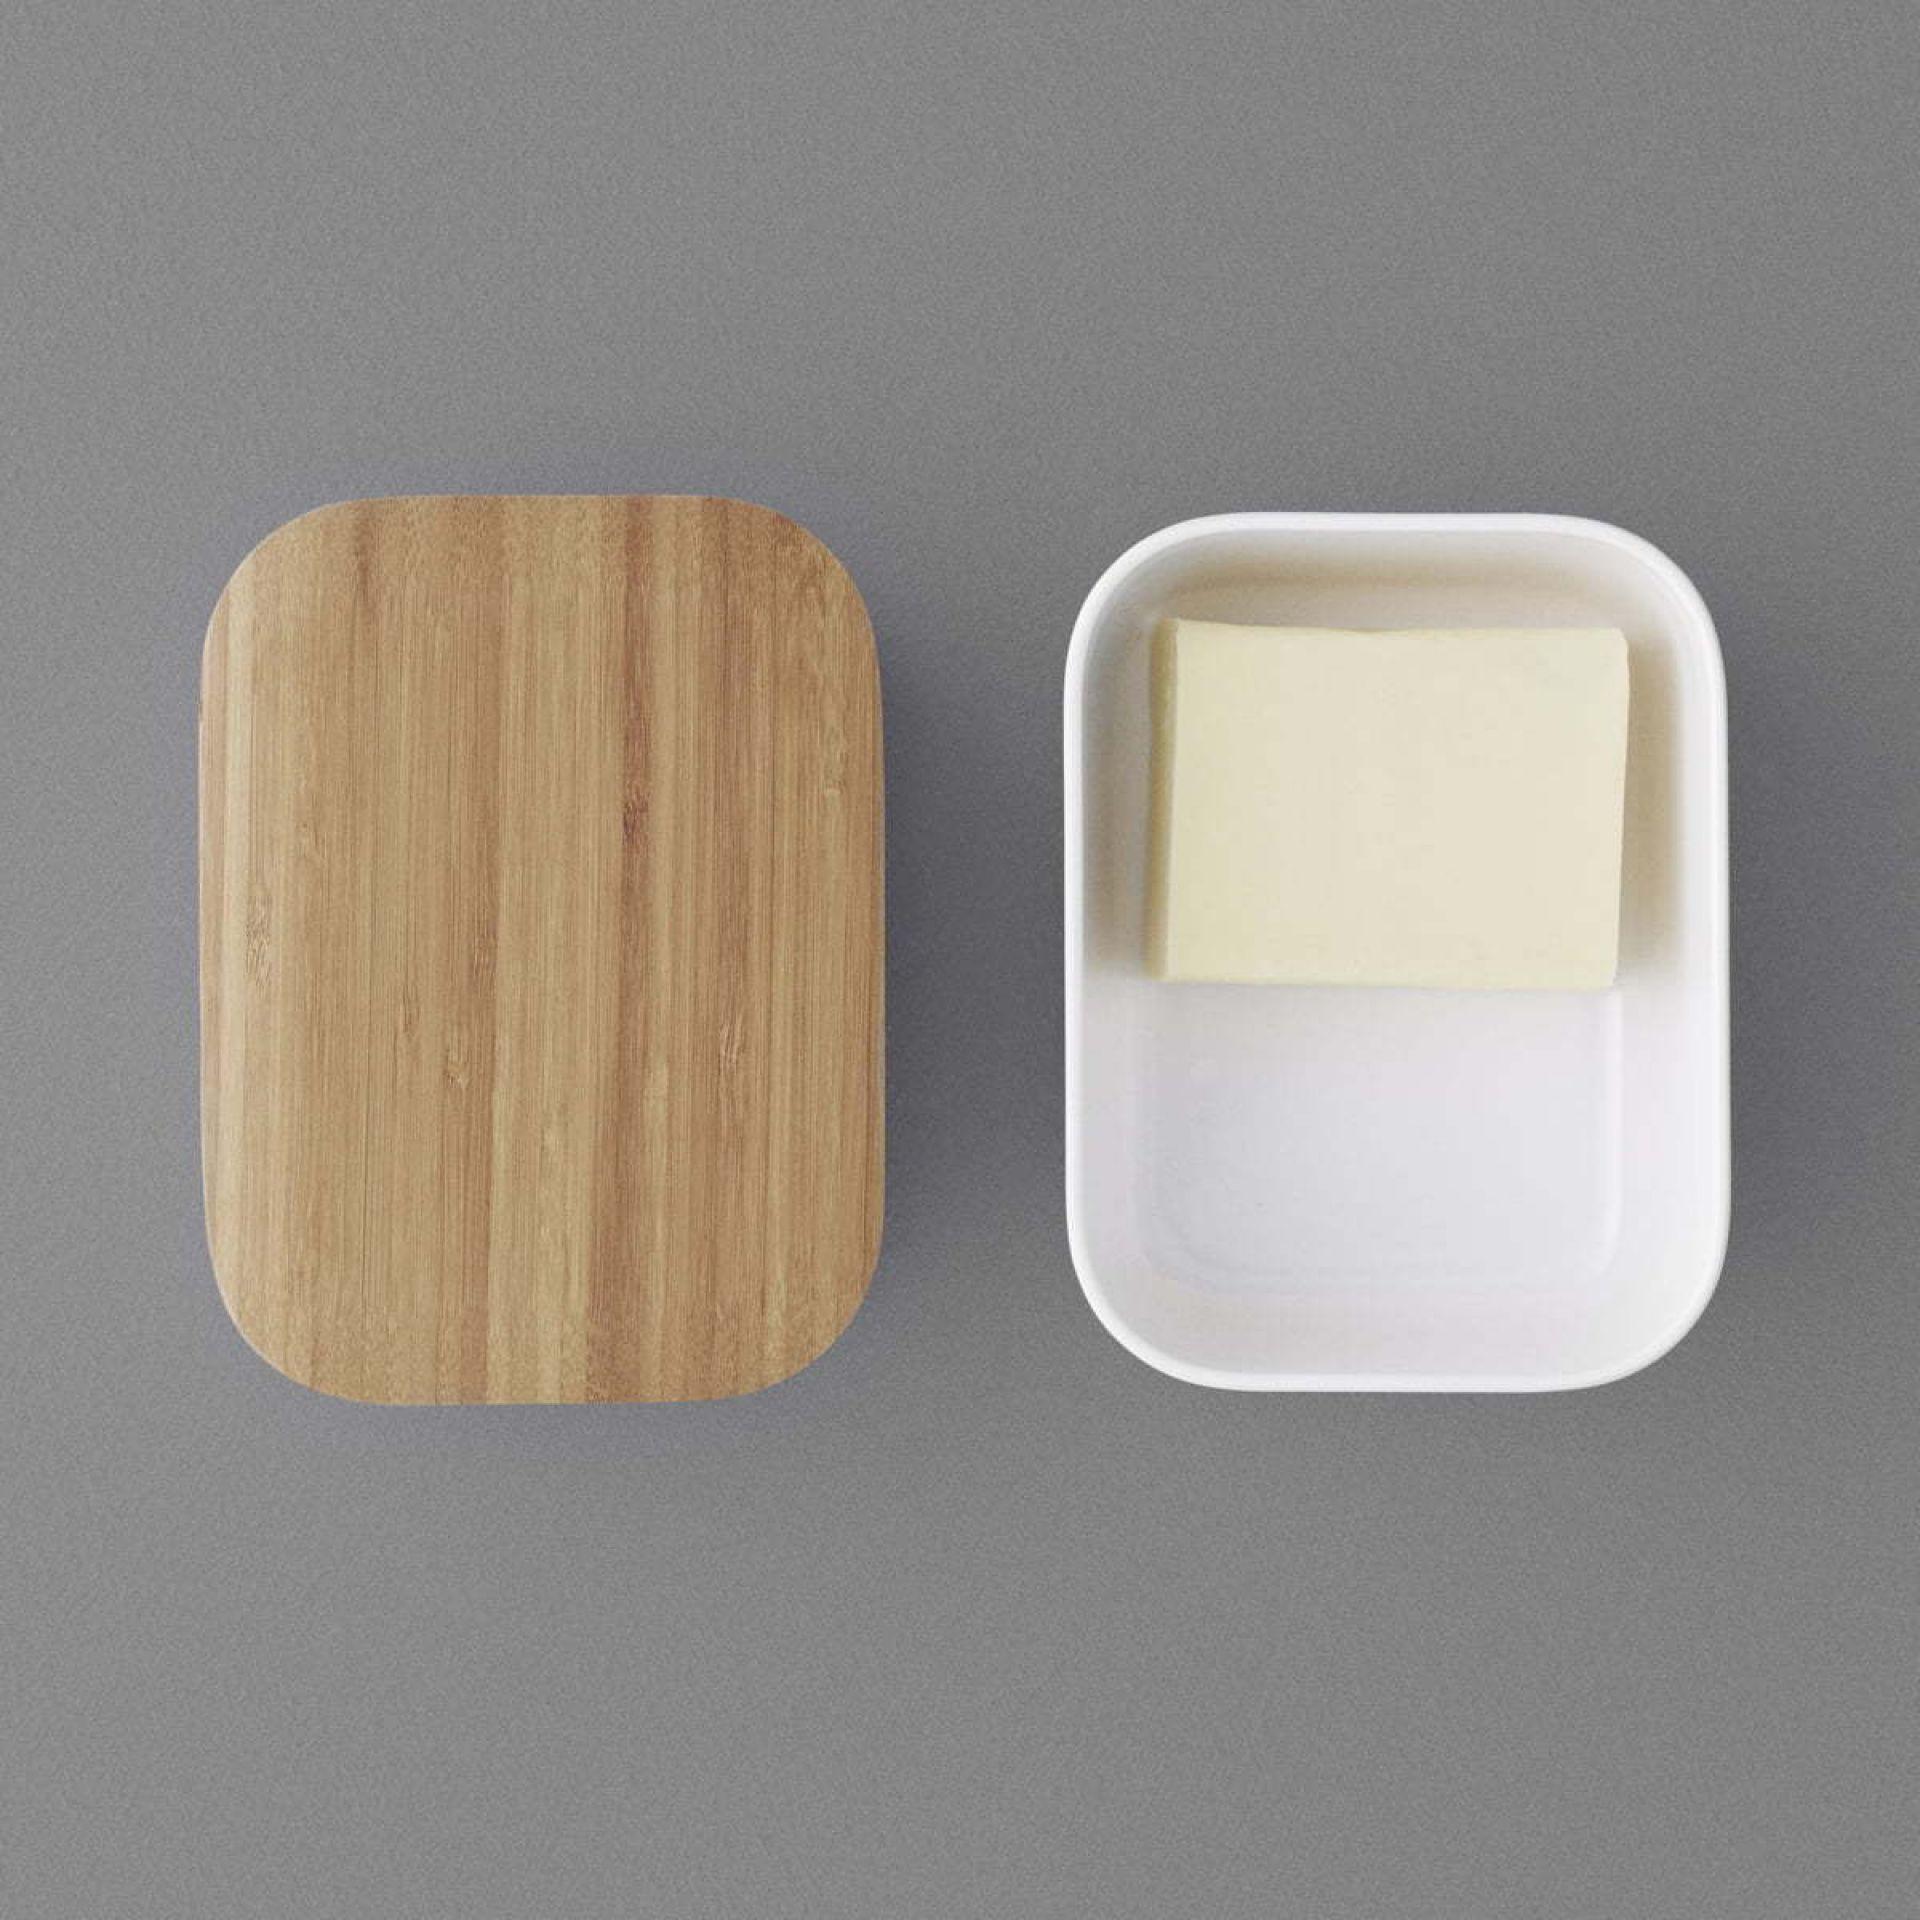 BOX-IT Butterdose Stelton schwarz